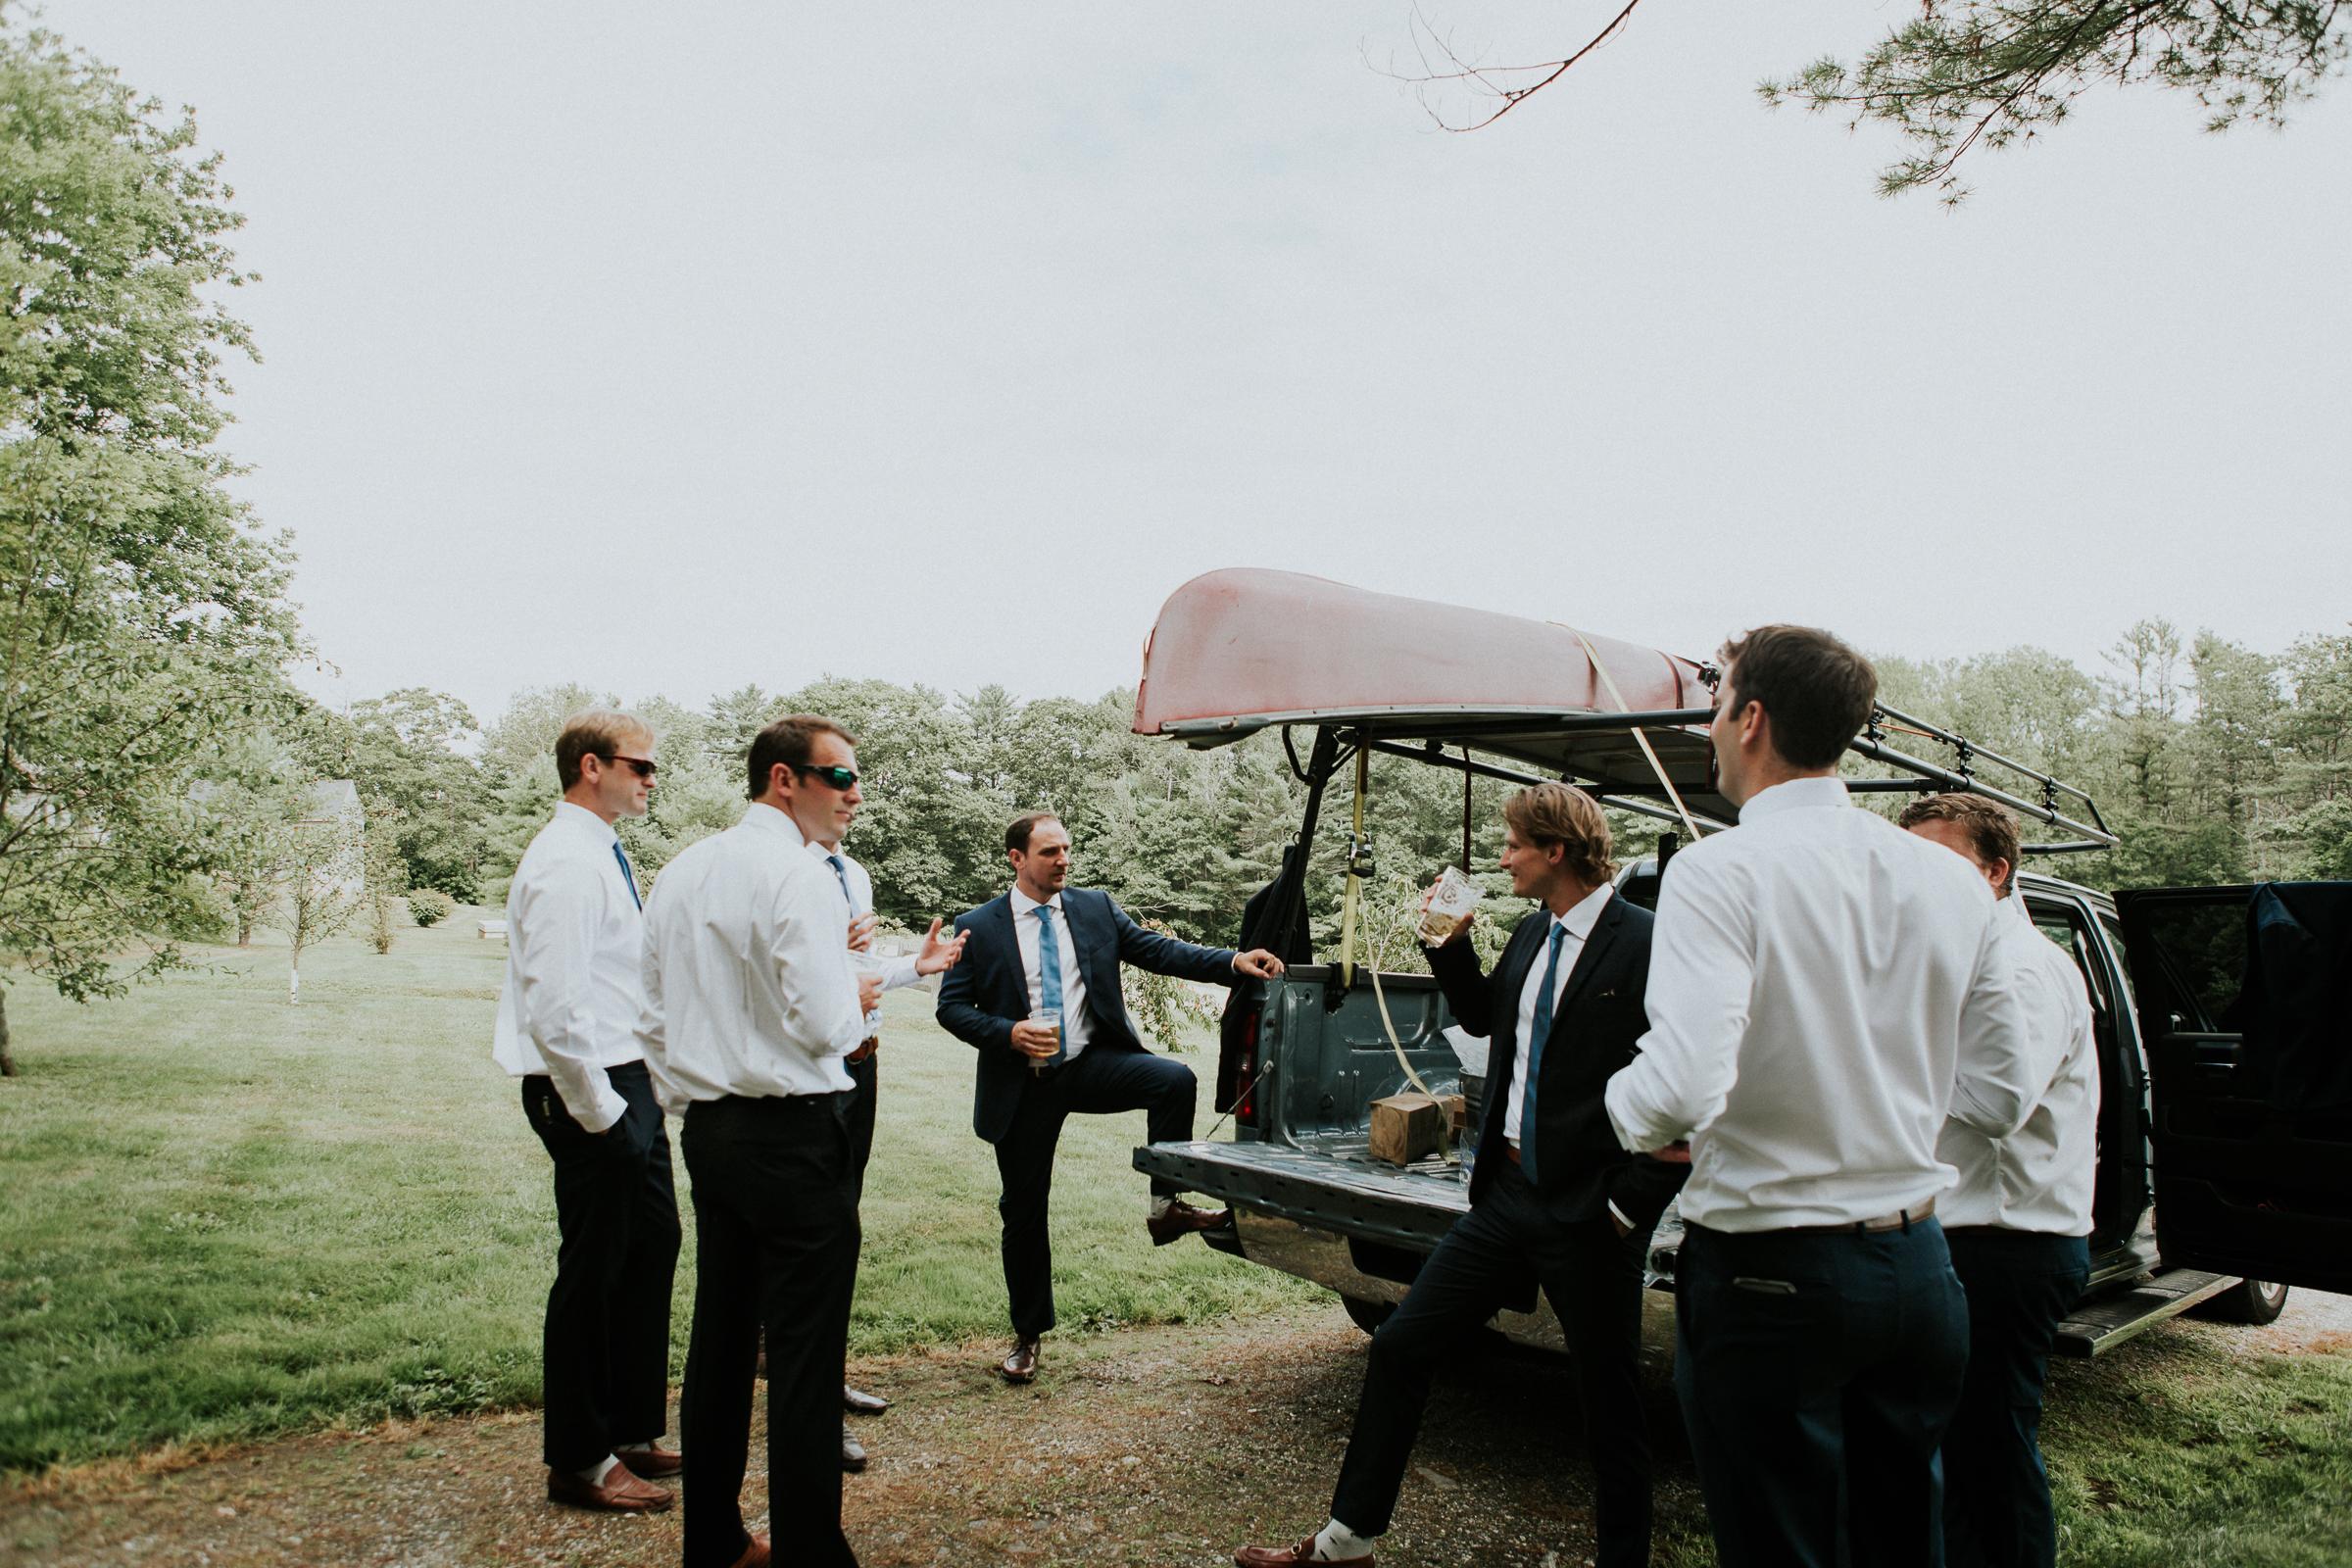 Marianmade-Farm-Wiscasset-Maine-Fine-Art-Documentary-Wedding-Photographer-Elvira-Kalviste-Photography-24.jpg